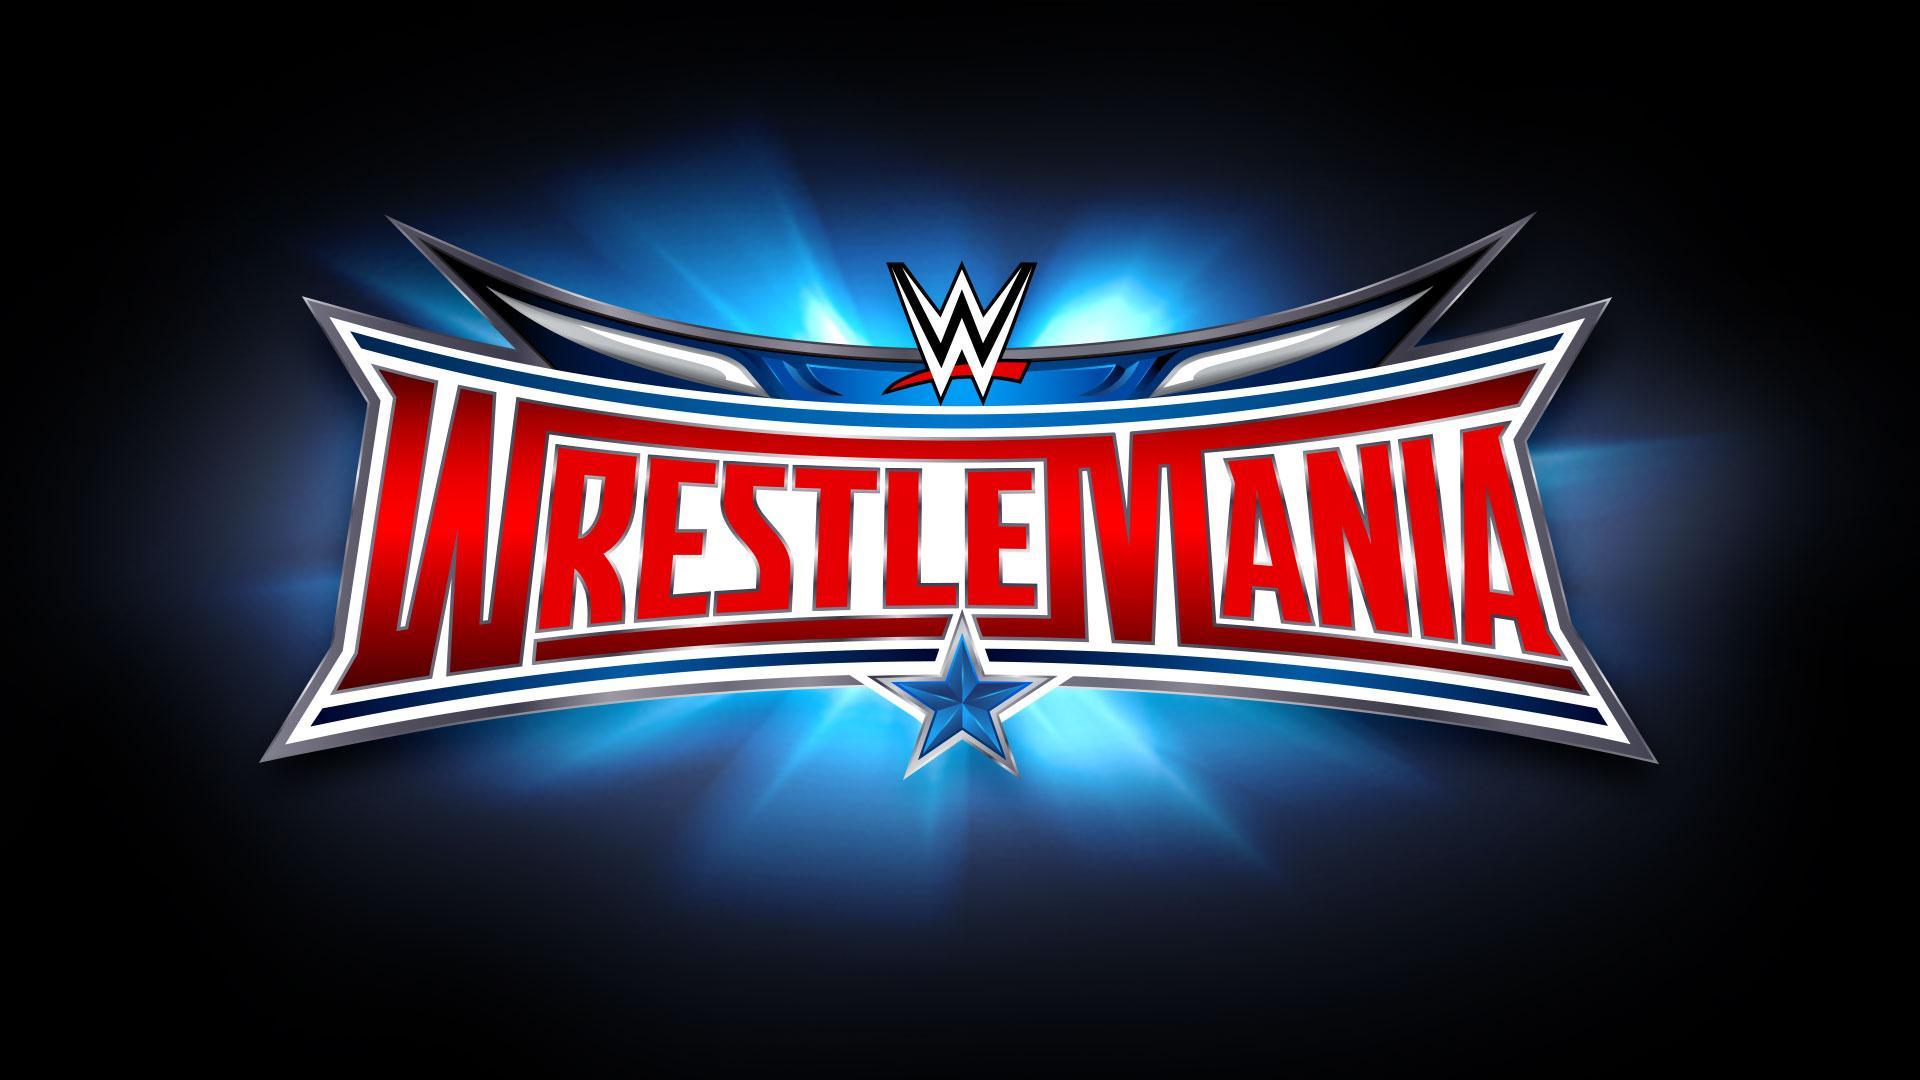 Wallpaper : illustration, logo, neon sign, WWE, brand, advertising